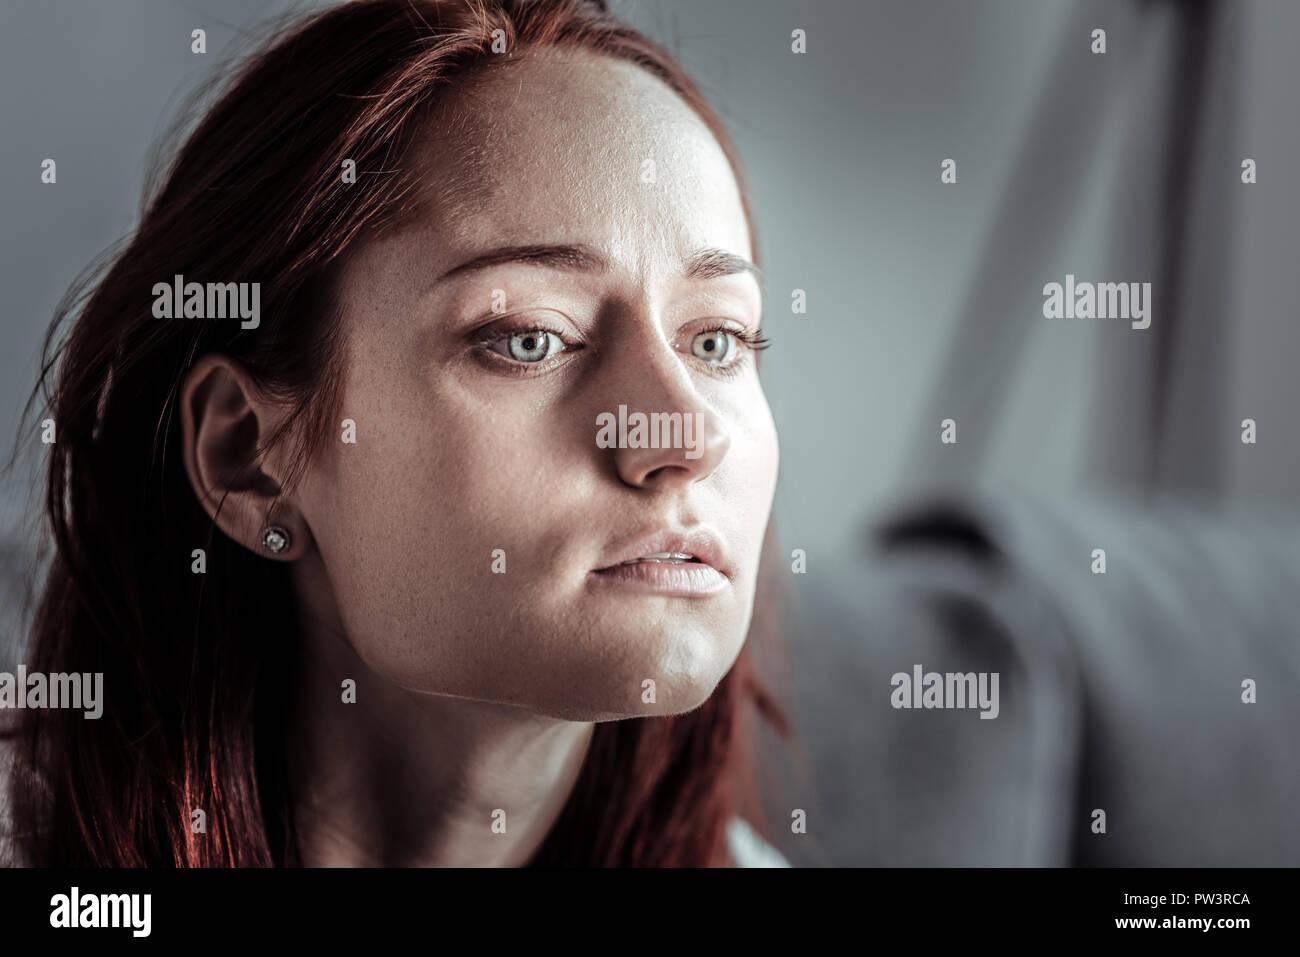 Thoughtful female person having depressive mood - Stock Image